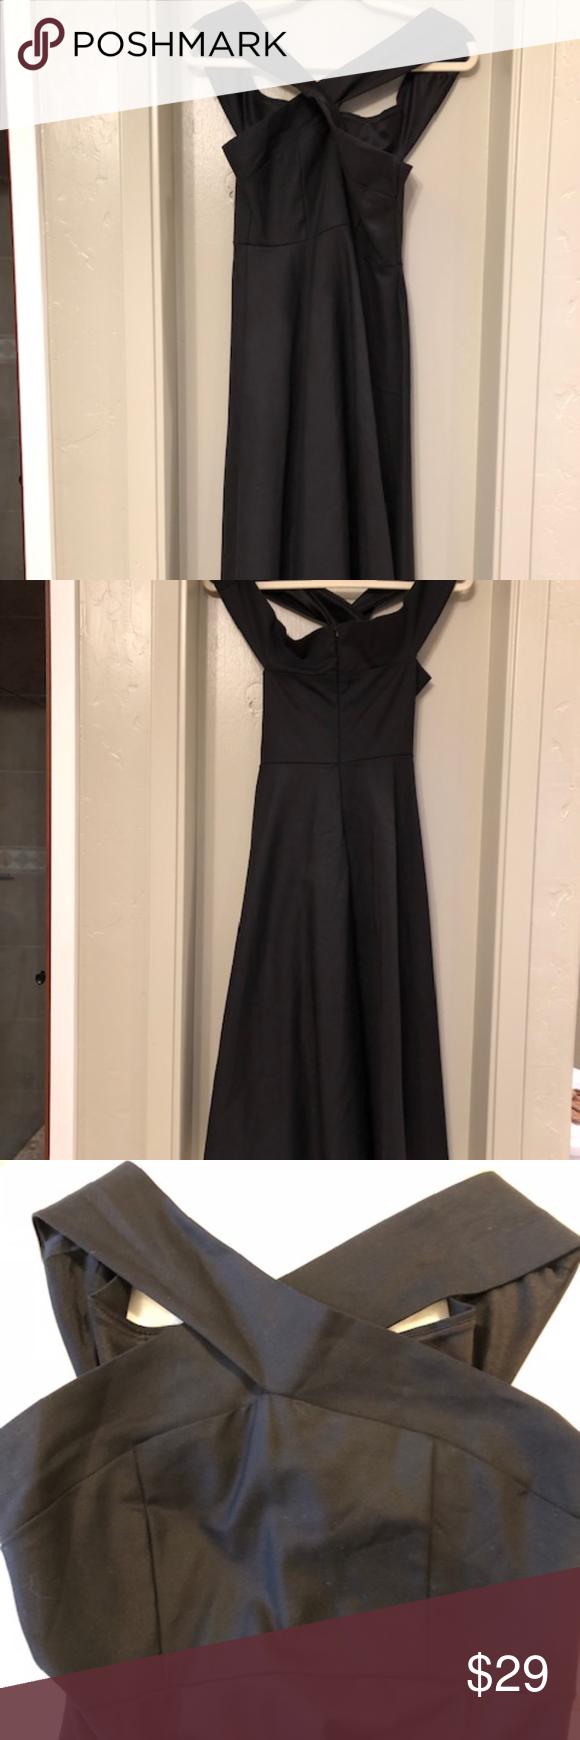 The Editor S Market Cross Front Dress Excellent Condition Black Cross Front Dress Zipper Back Closure Straight Wide Stra Cross Front Dress Dresses Dress Zipper [ 1740 x 580 Pixel ]